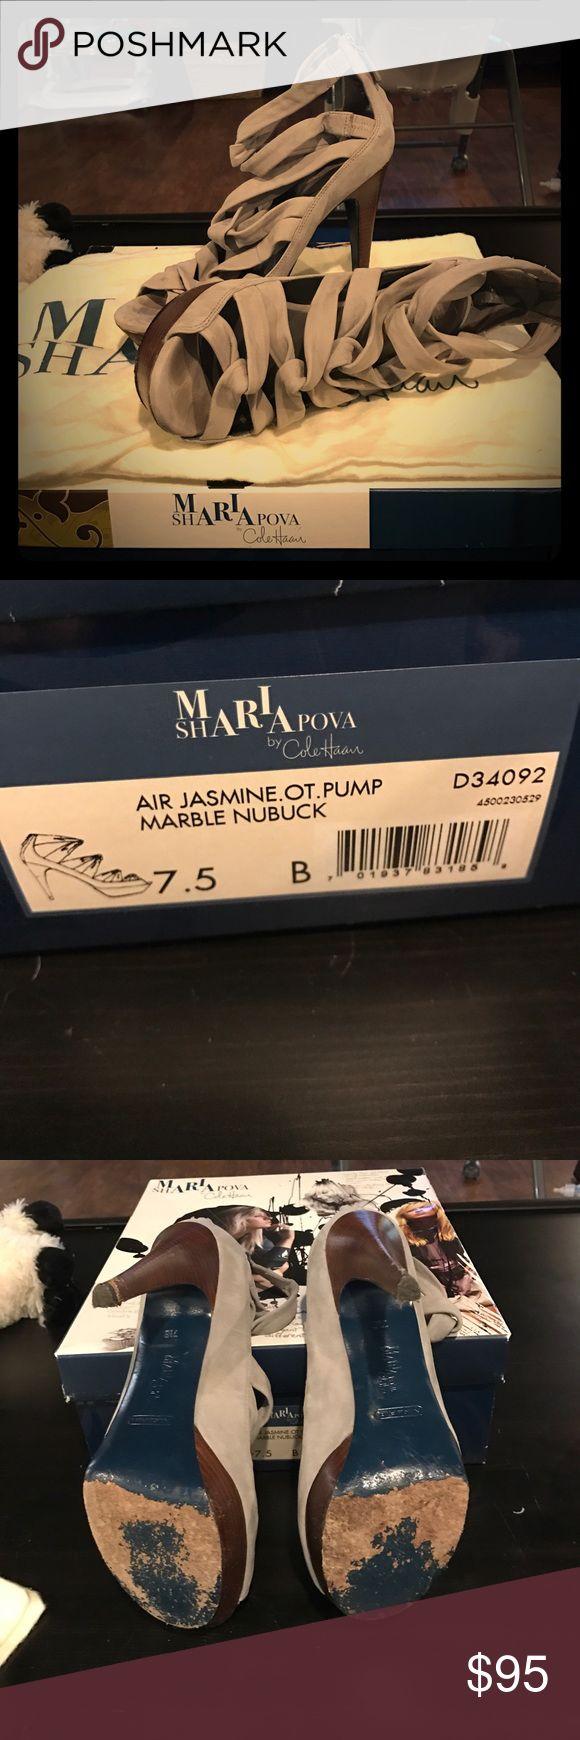 Maria Sharapova by Cole Haan Air Jasmine OT Pump Marble Nubucket color Gray size 7.5 Cole Haan Shoes Heels